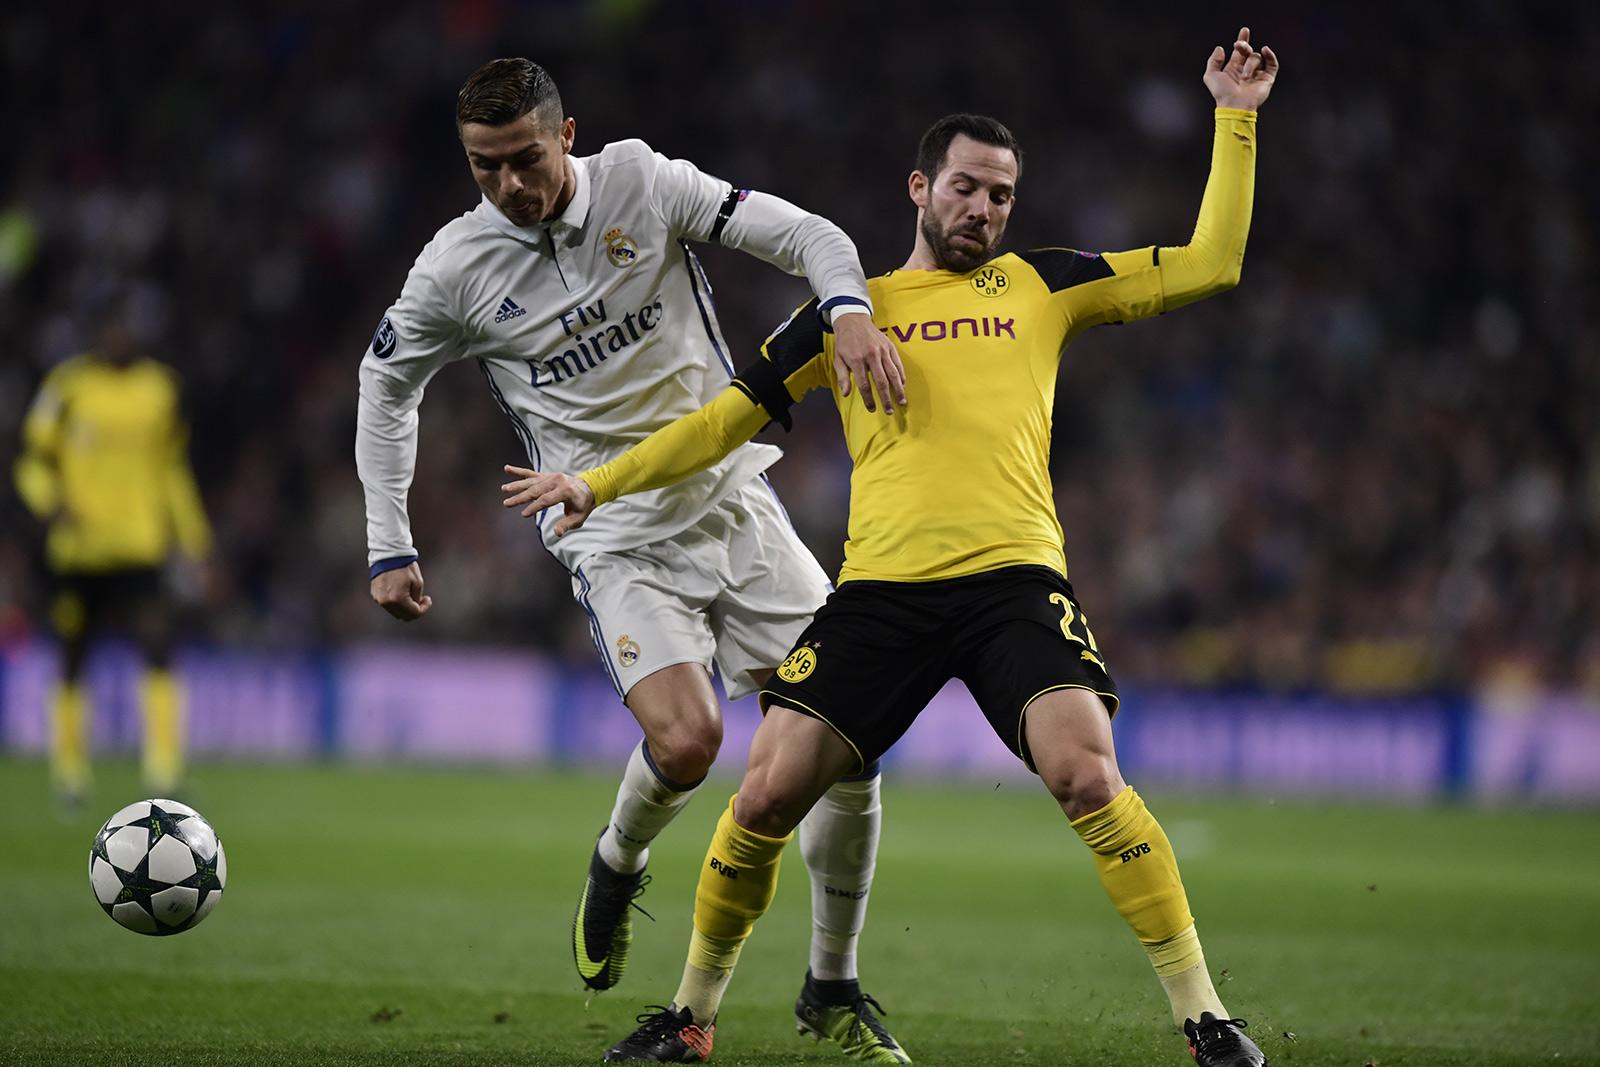 BL-sorsolás: kemény csoportban a Real, de a Barca és a ...